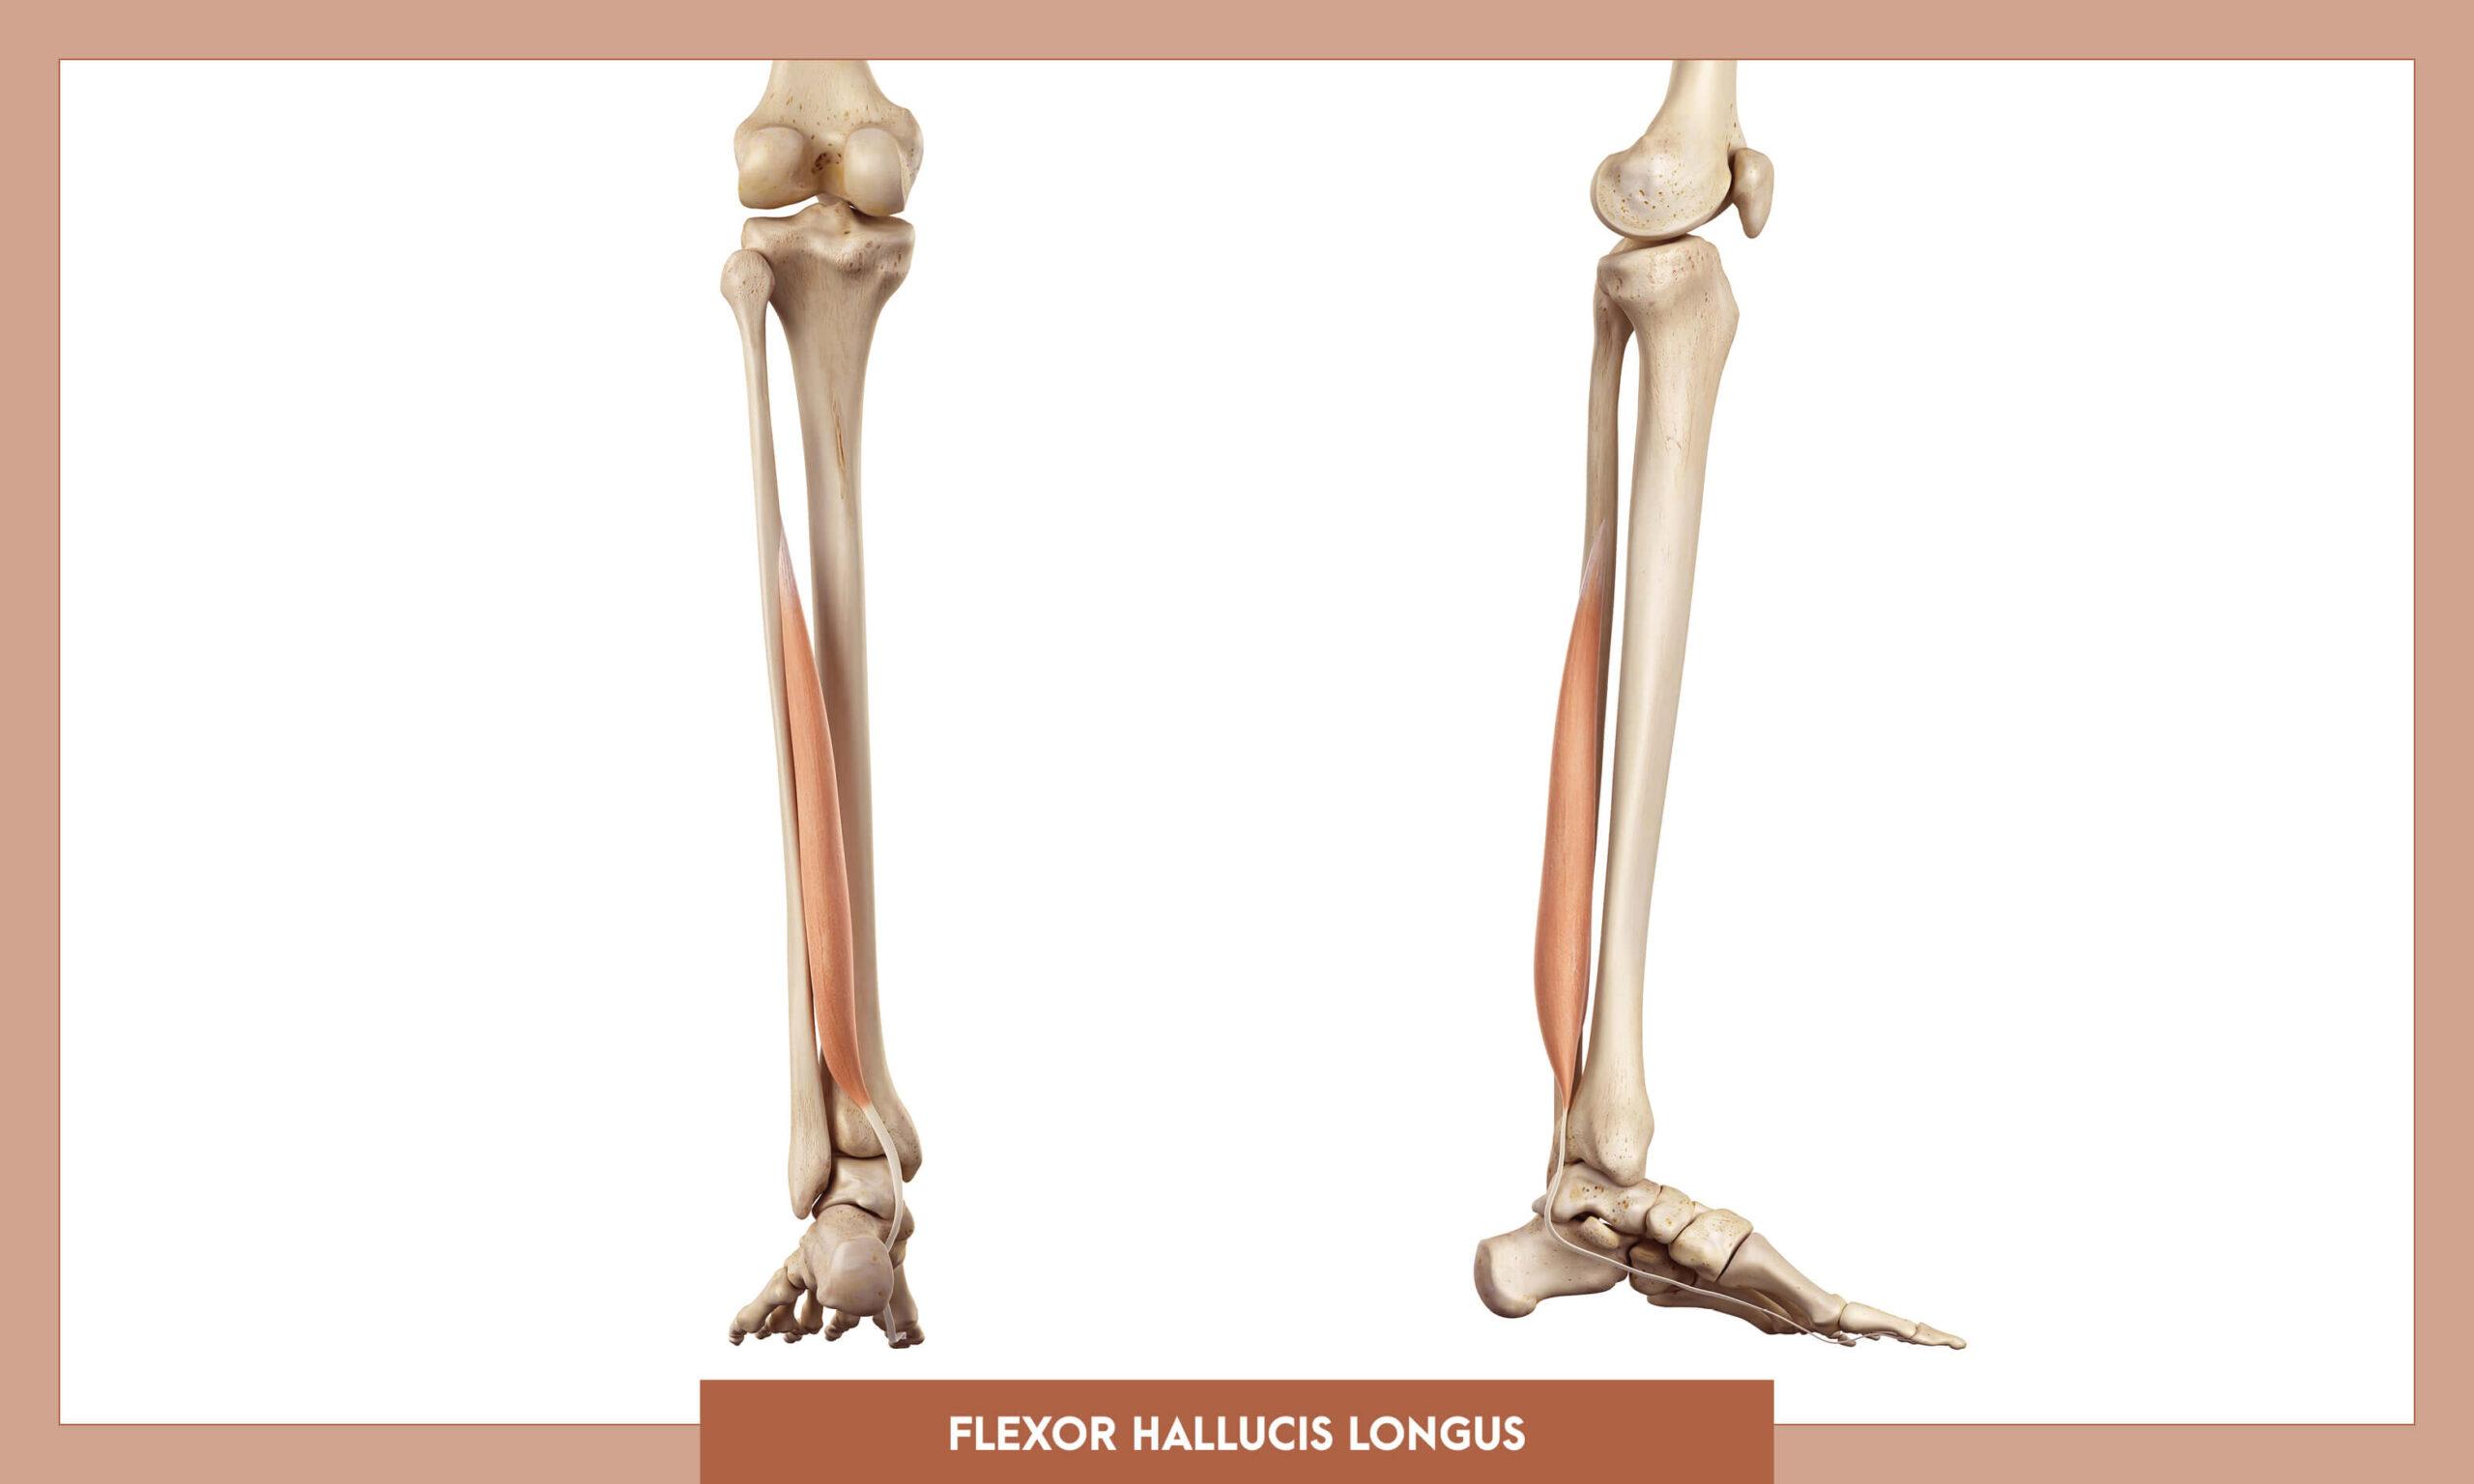 Muscles of thee Lower Limb - Flexor hallucis longus